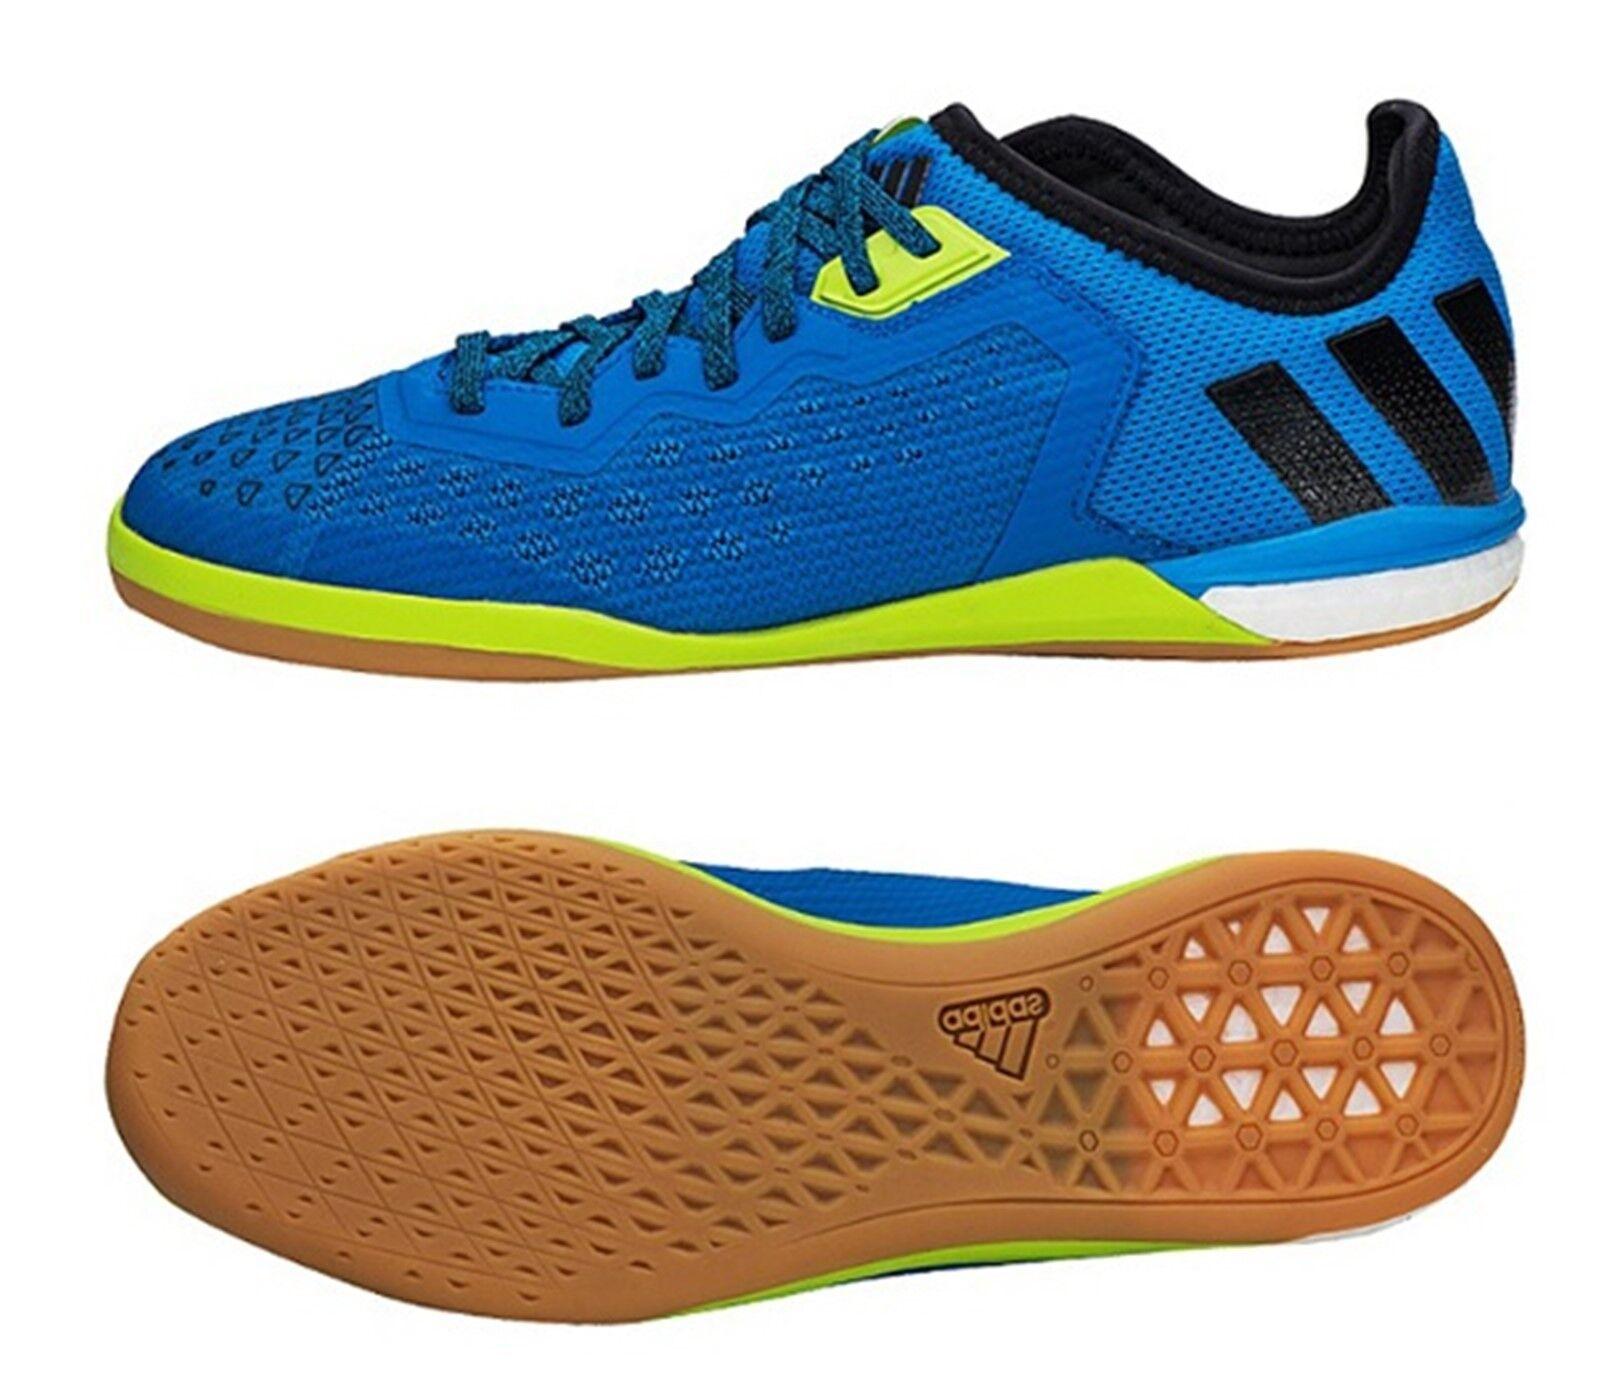 Adidas Azul Interior Tribunal Ace 16.1 Hombre Zapatos de fútbol Zapatos bota de Futsal AF4250